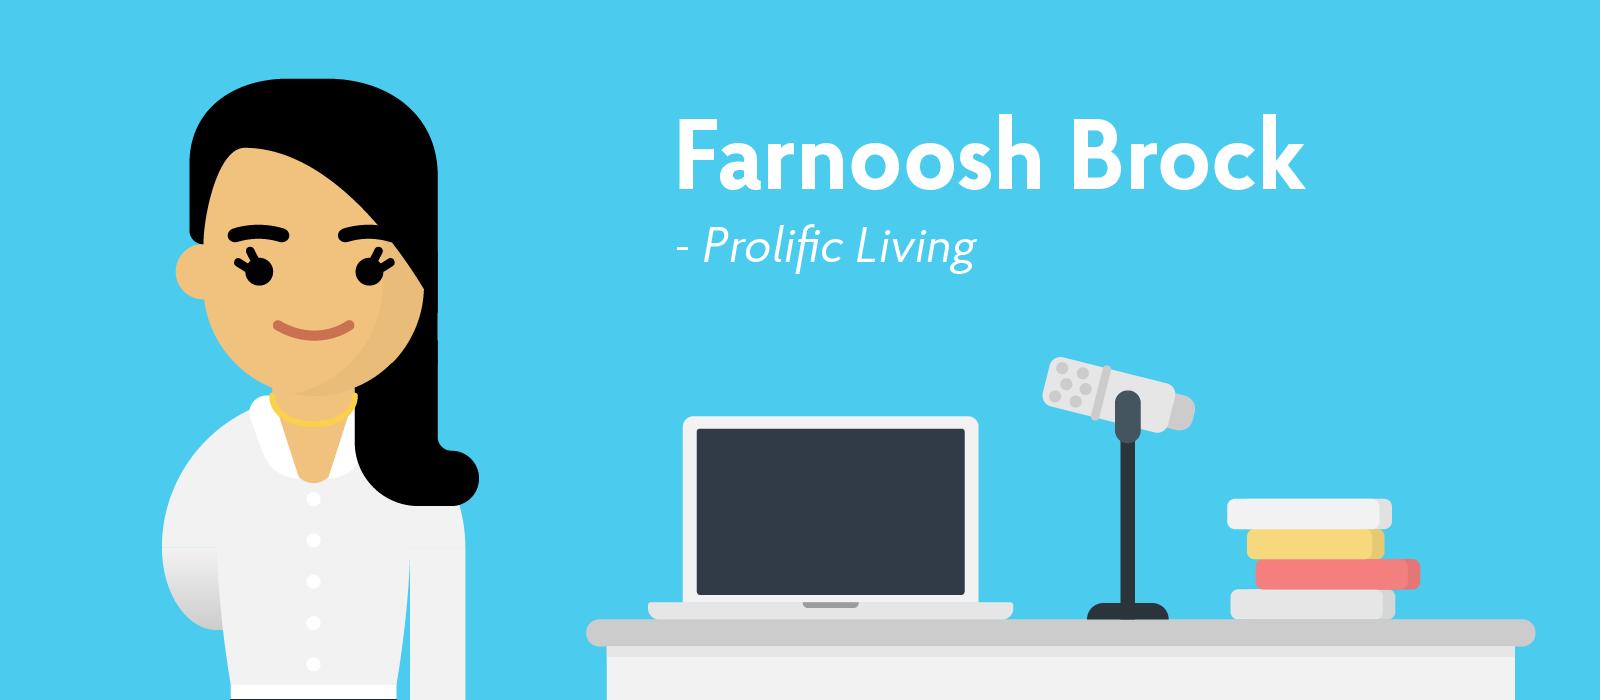 Farnoosh Brock career influencer